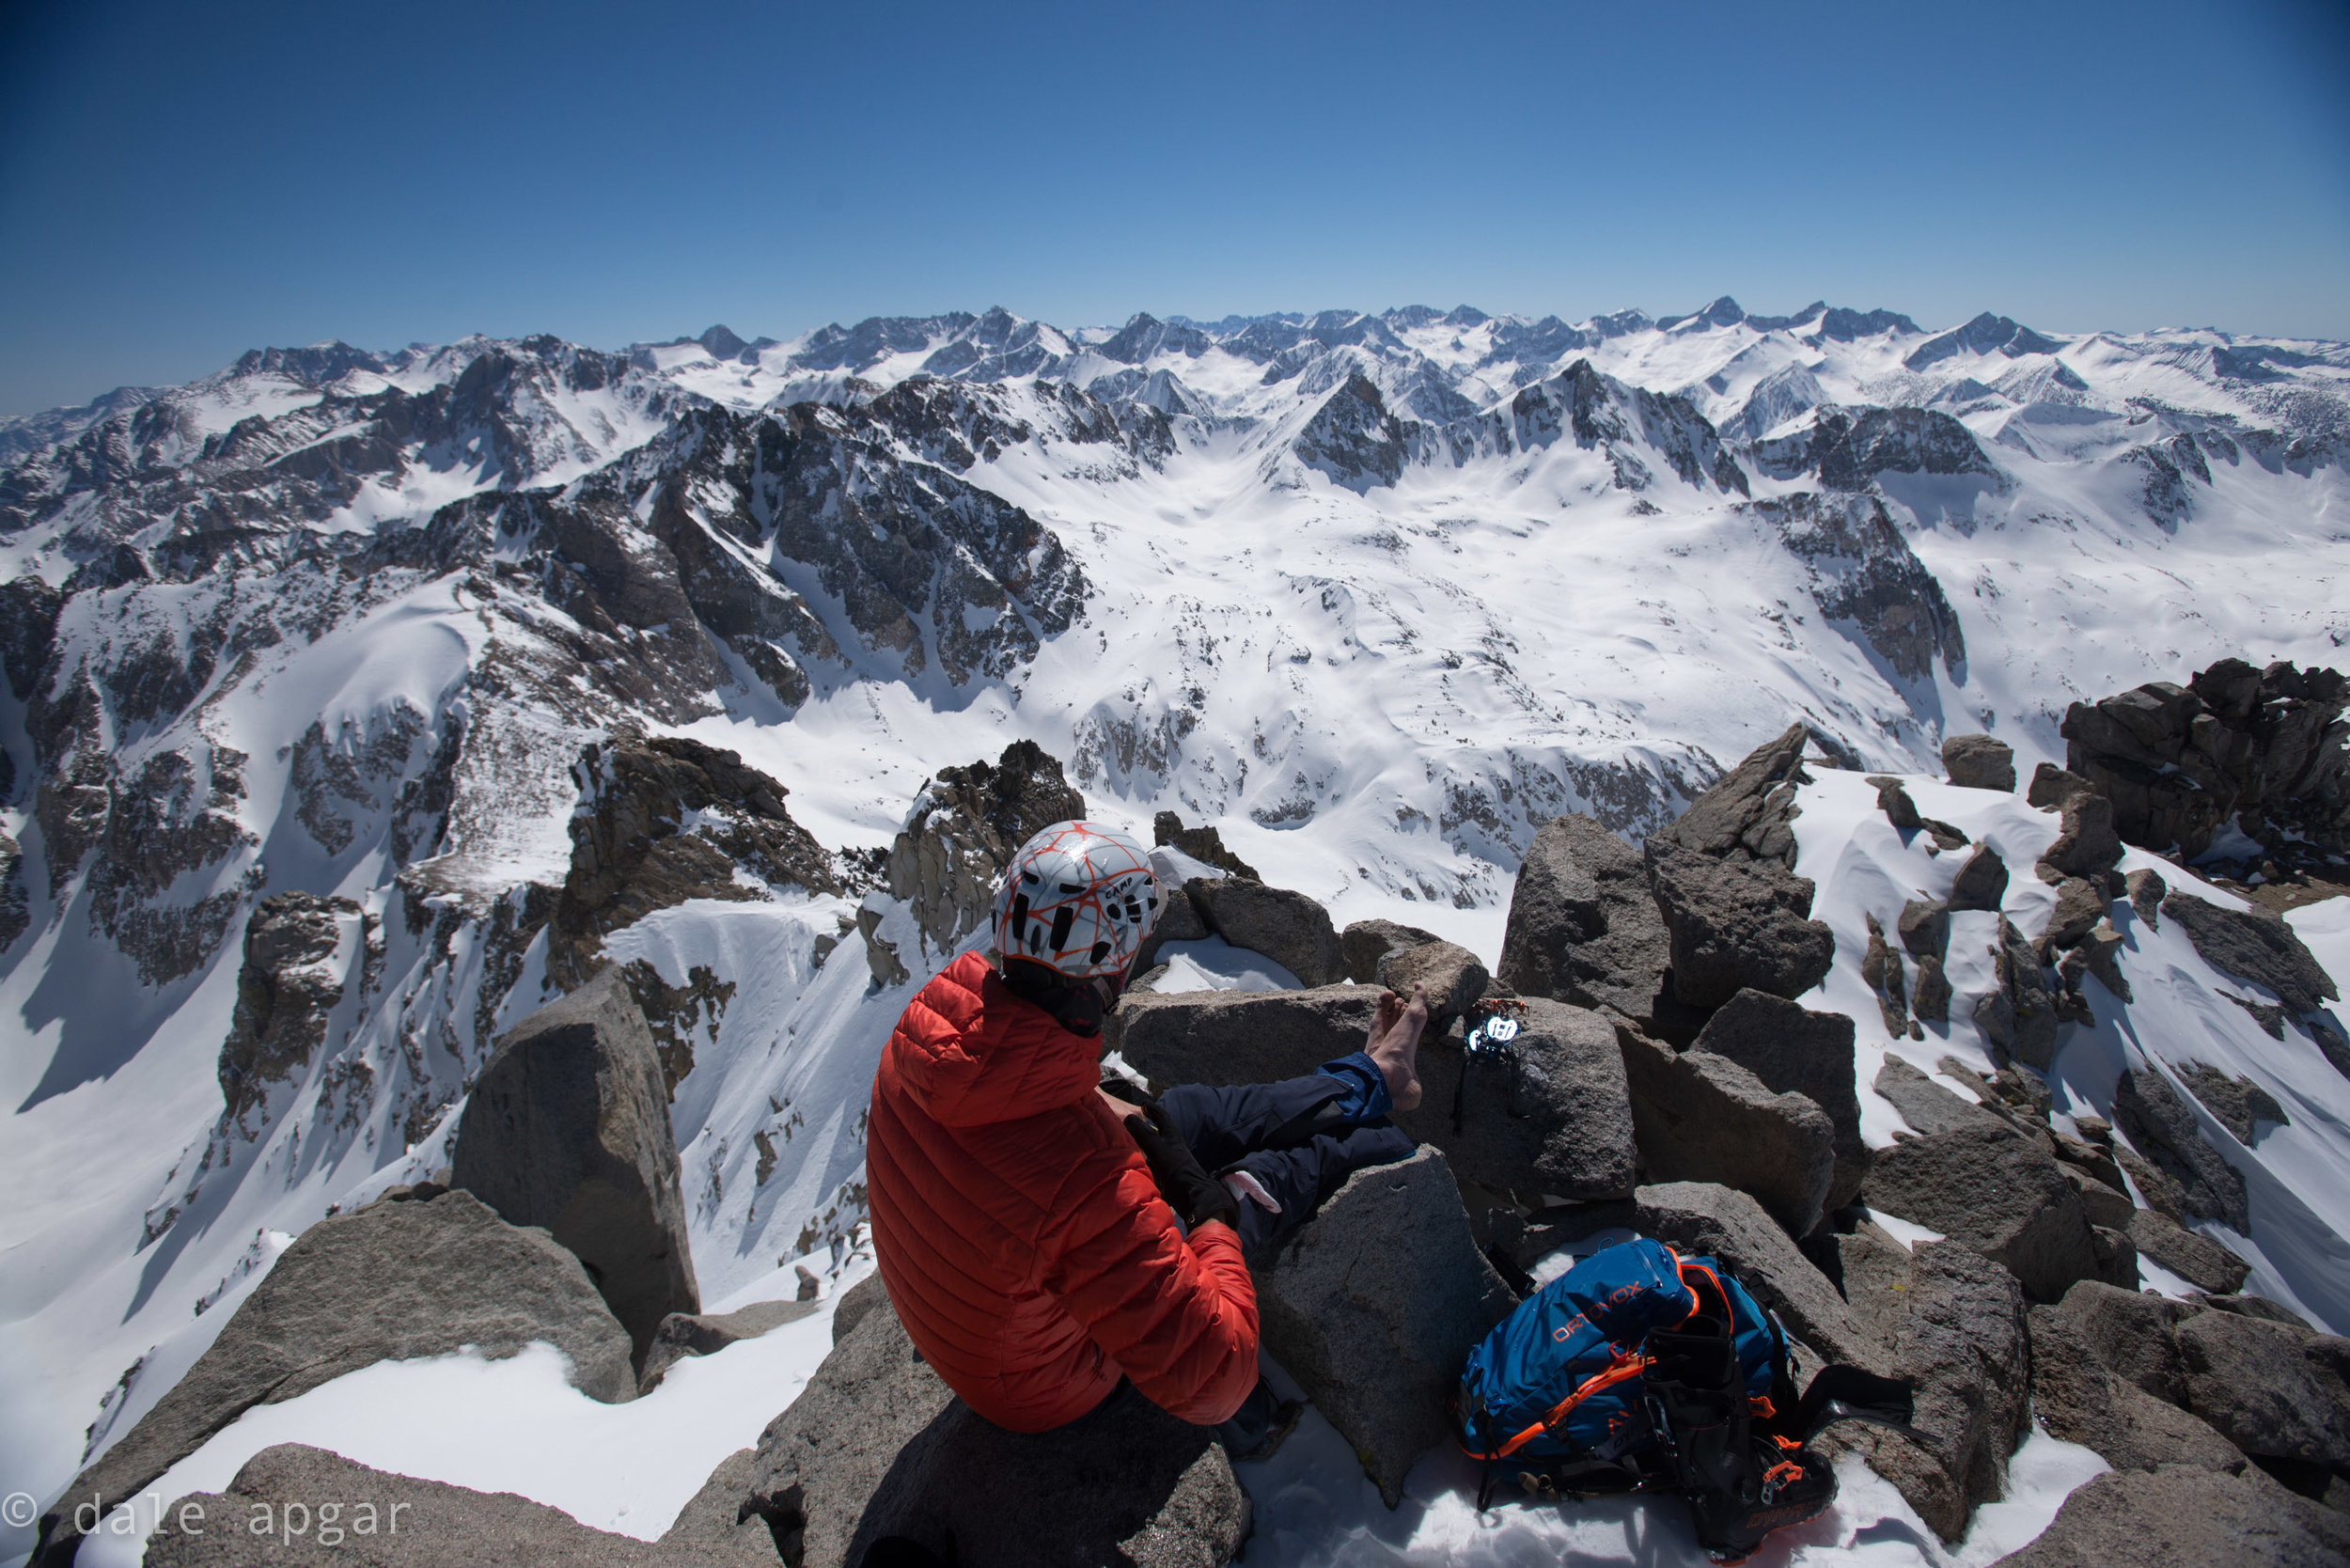 Ben, taking a barefoot break atop Black Peak.